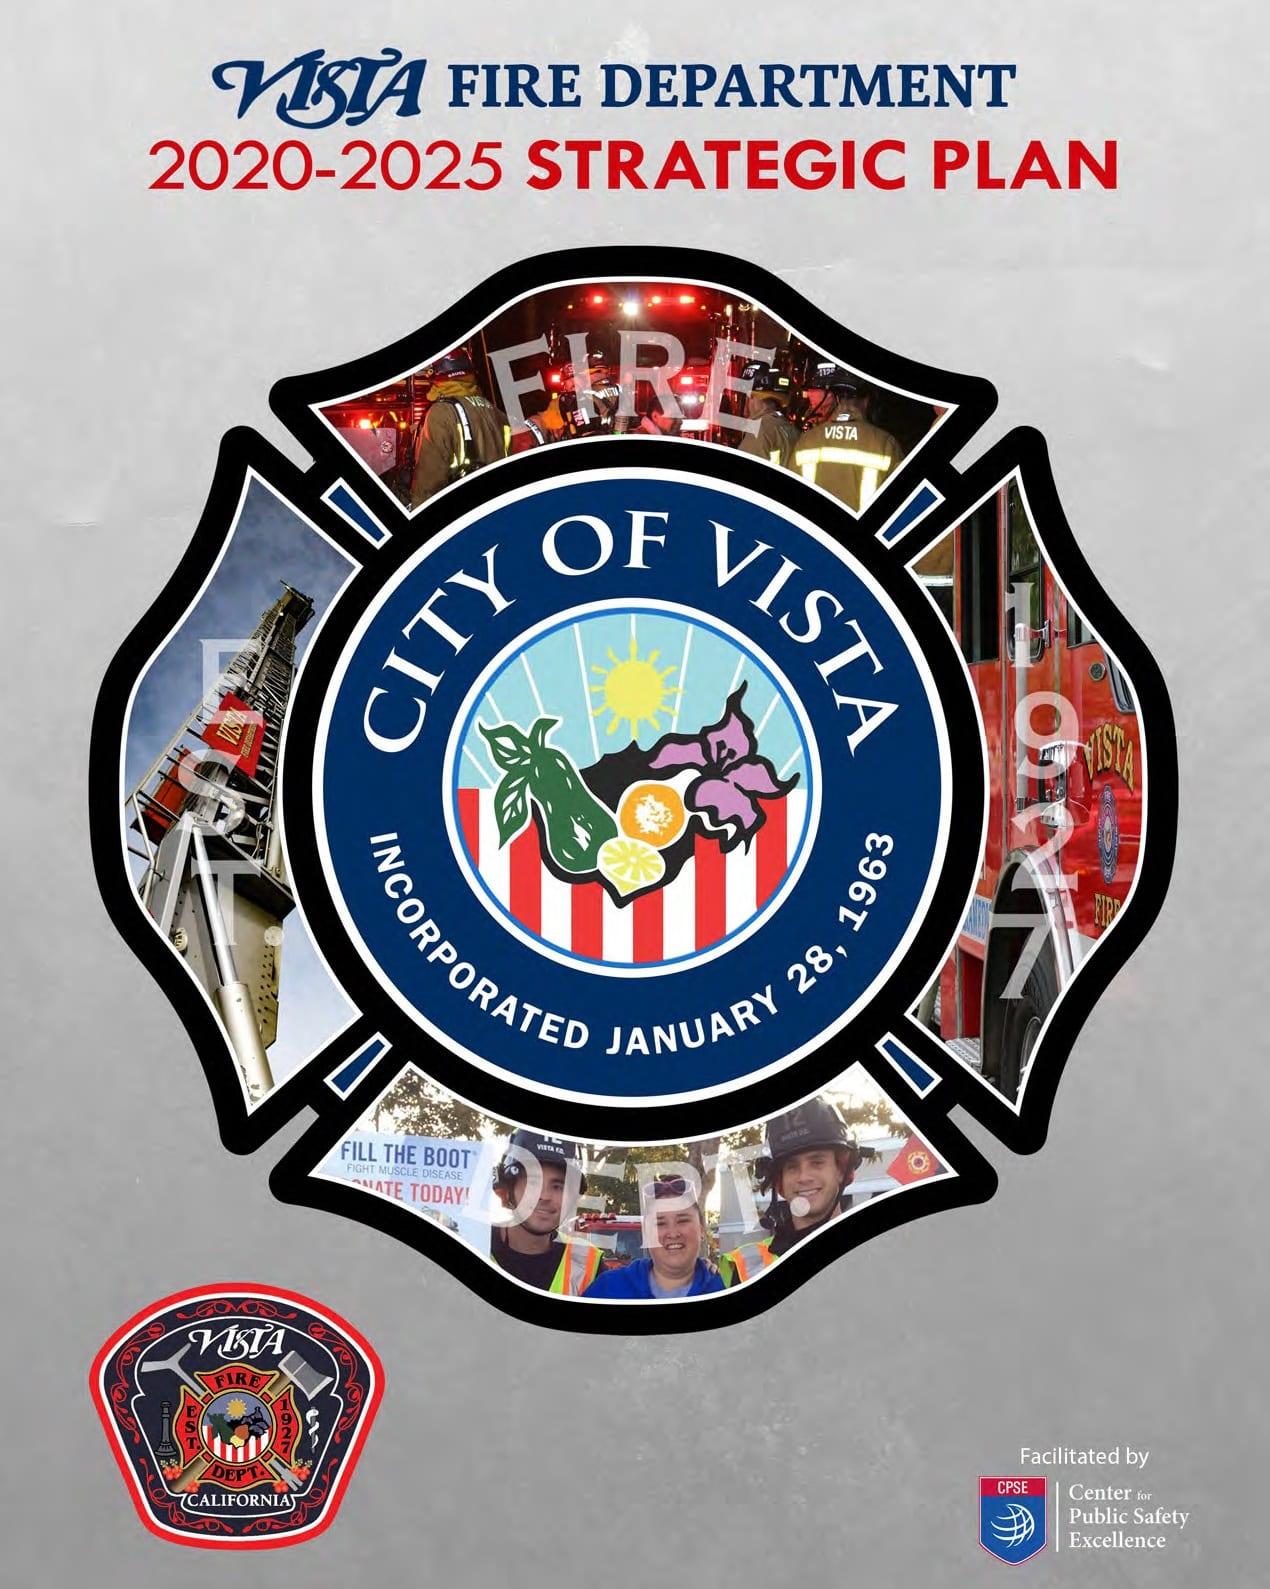 Vista Fire Department Updates Five Year Strategic Plan For